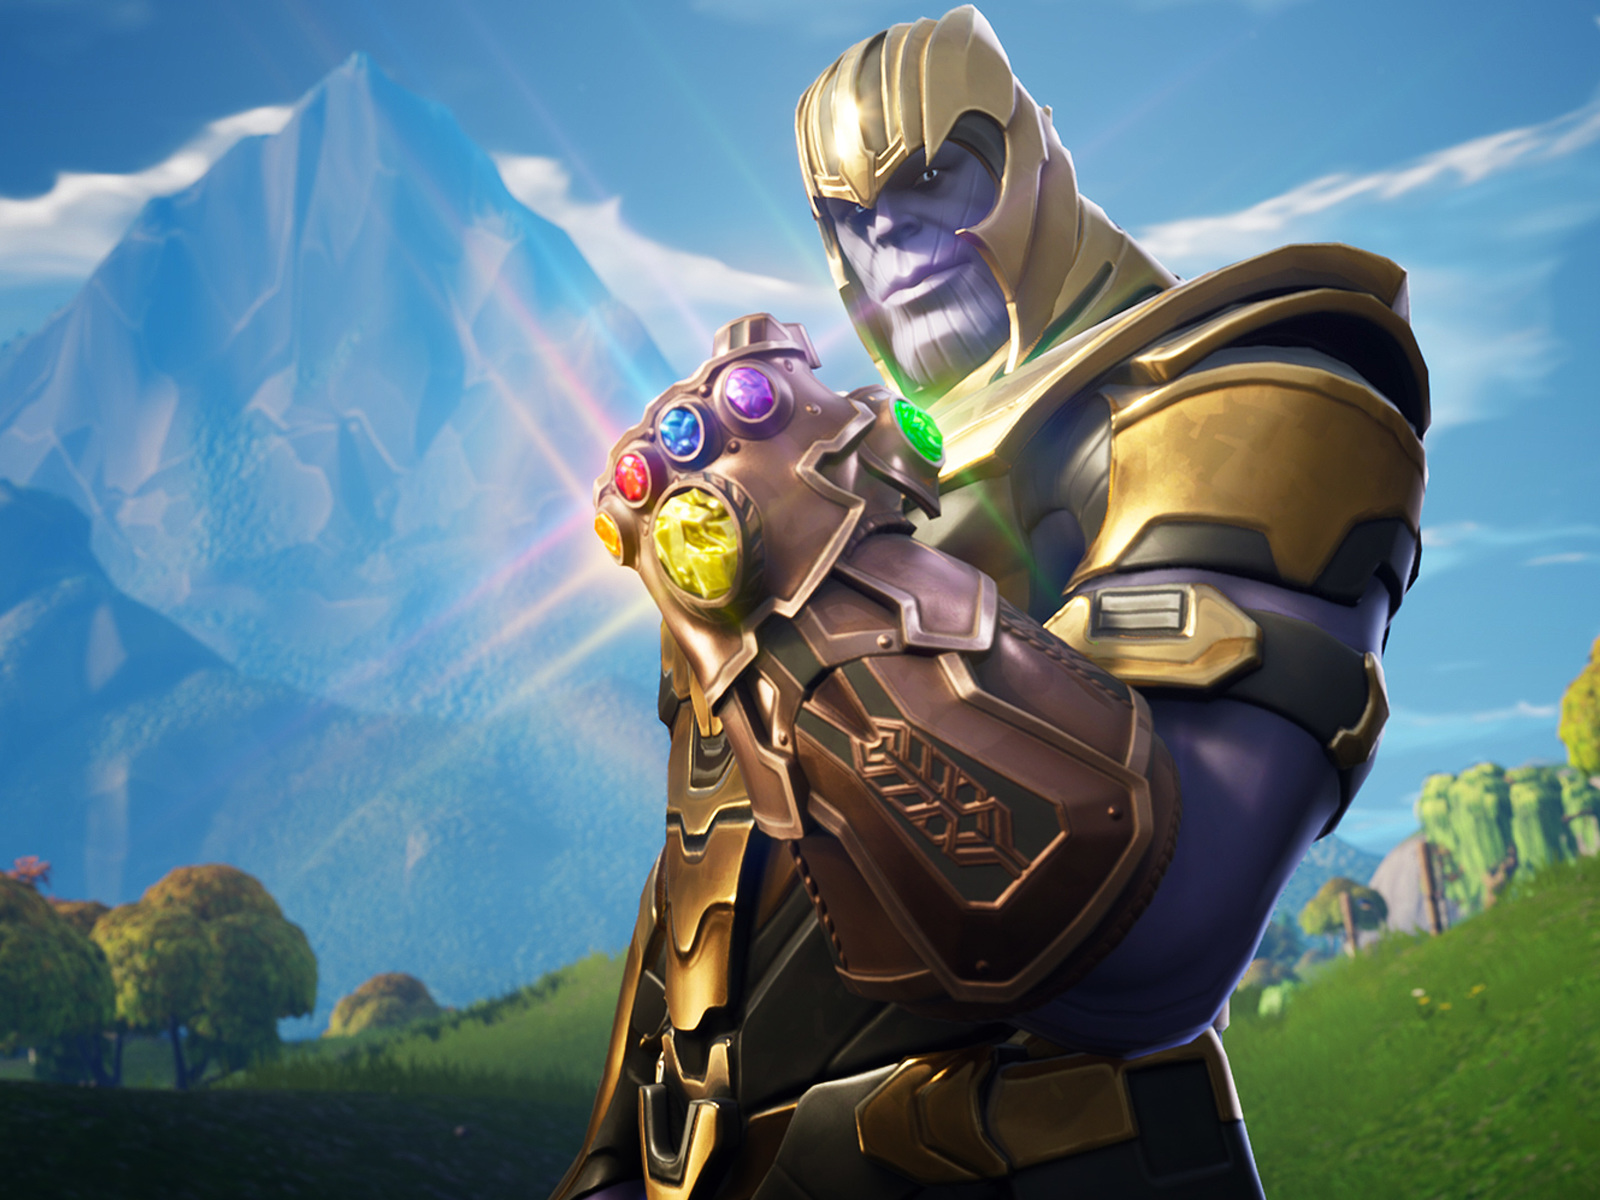 1600x1200 Thanos In Fortnite Battle Royale 1600x1200 Resolution HD 1600x1200